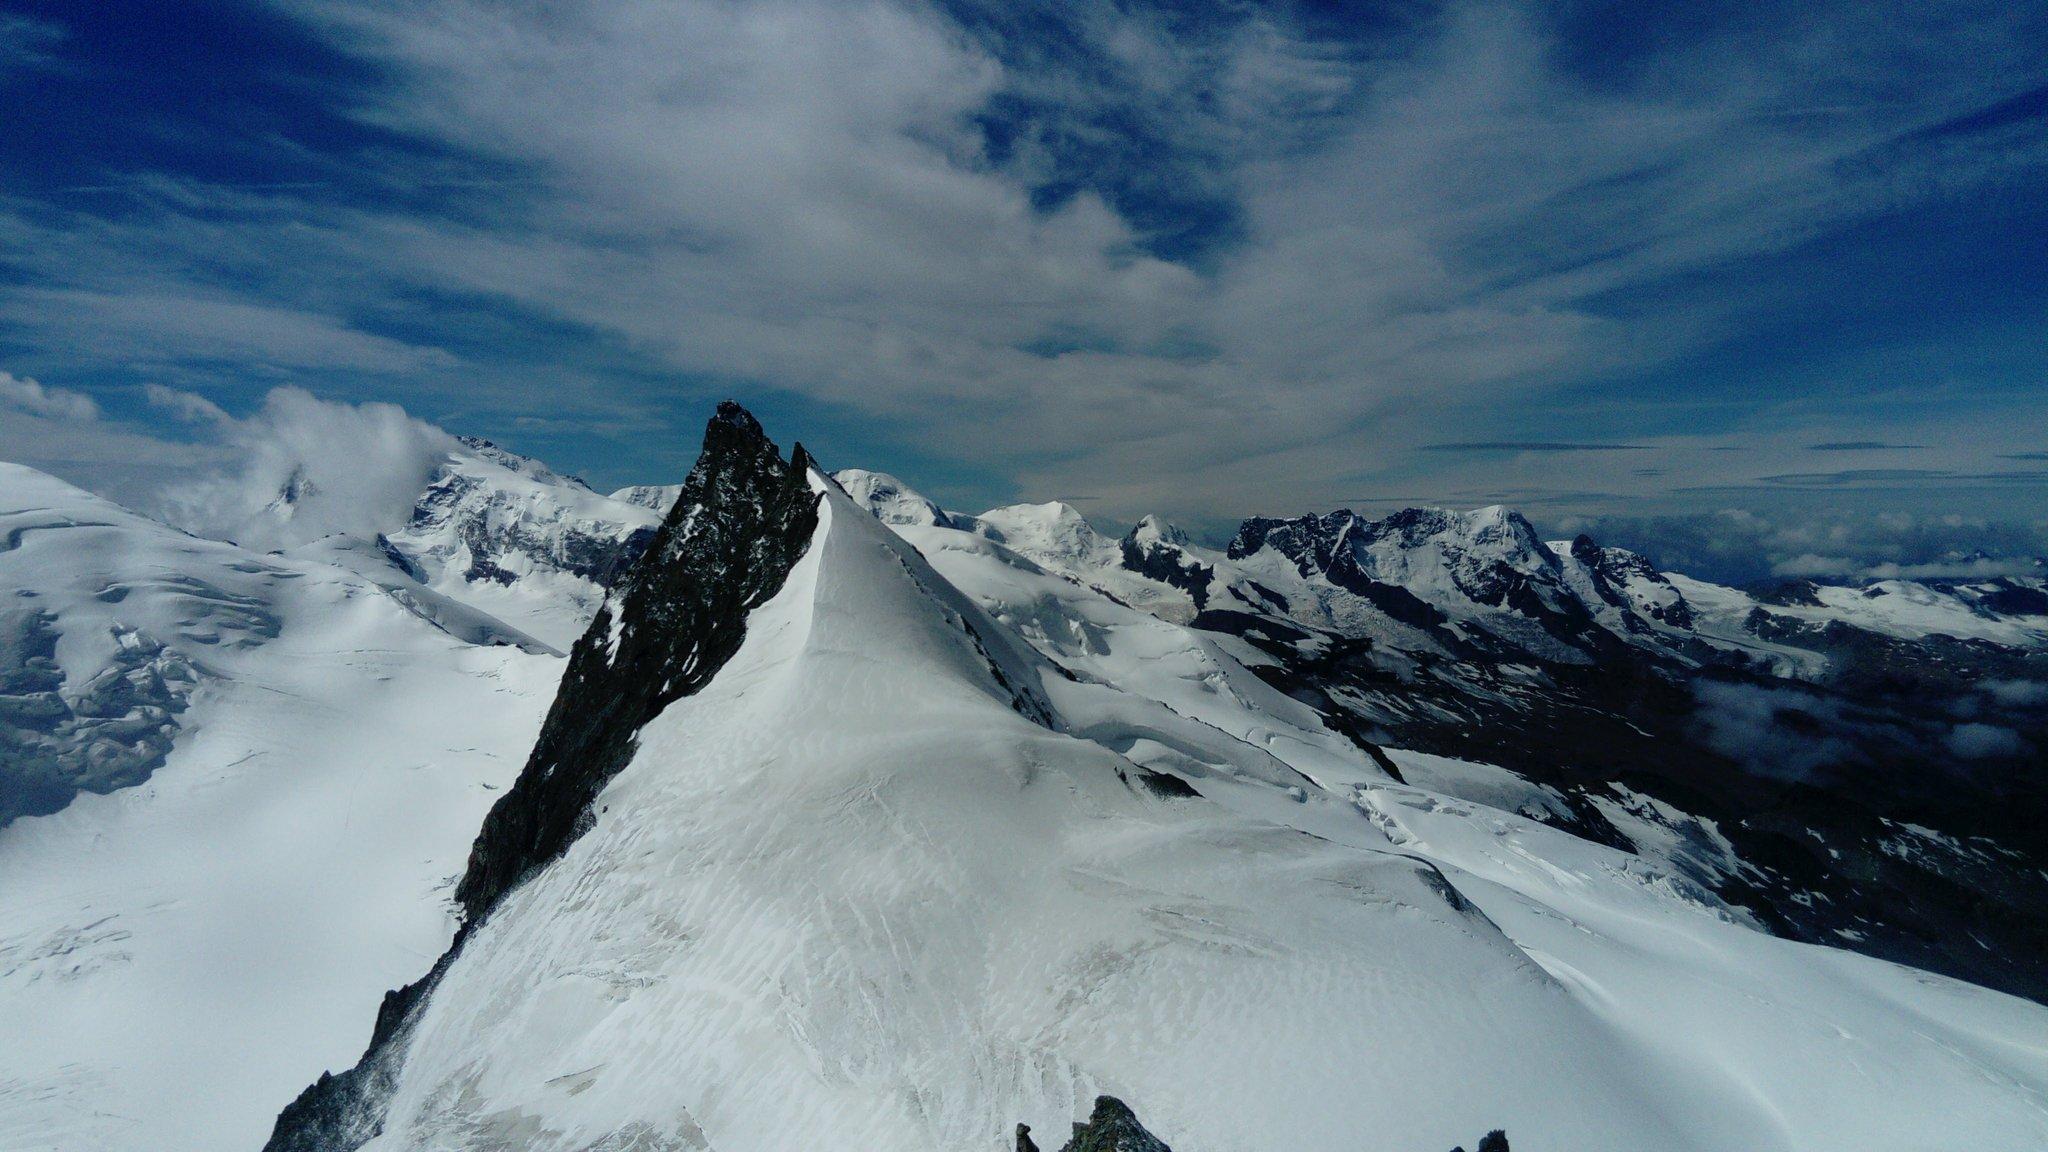 The Rimpfischhorn from the summit of the Allalinhorn